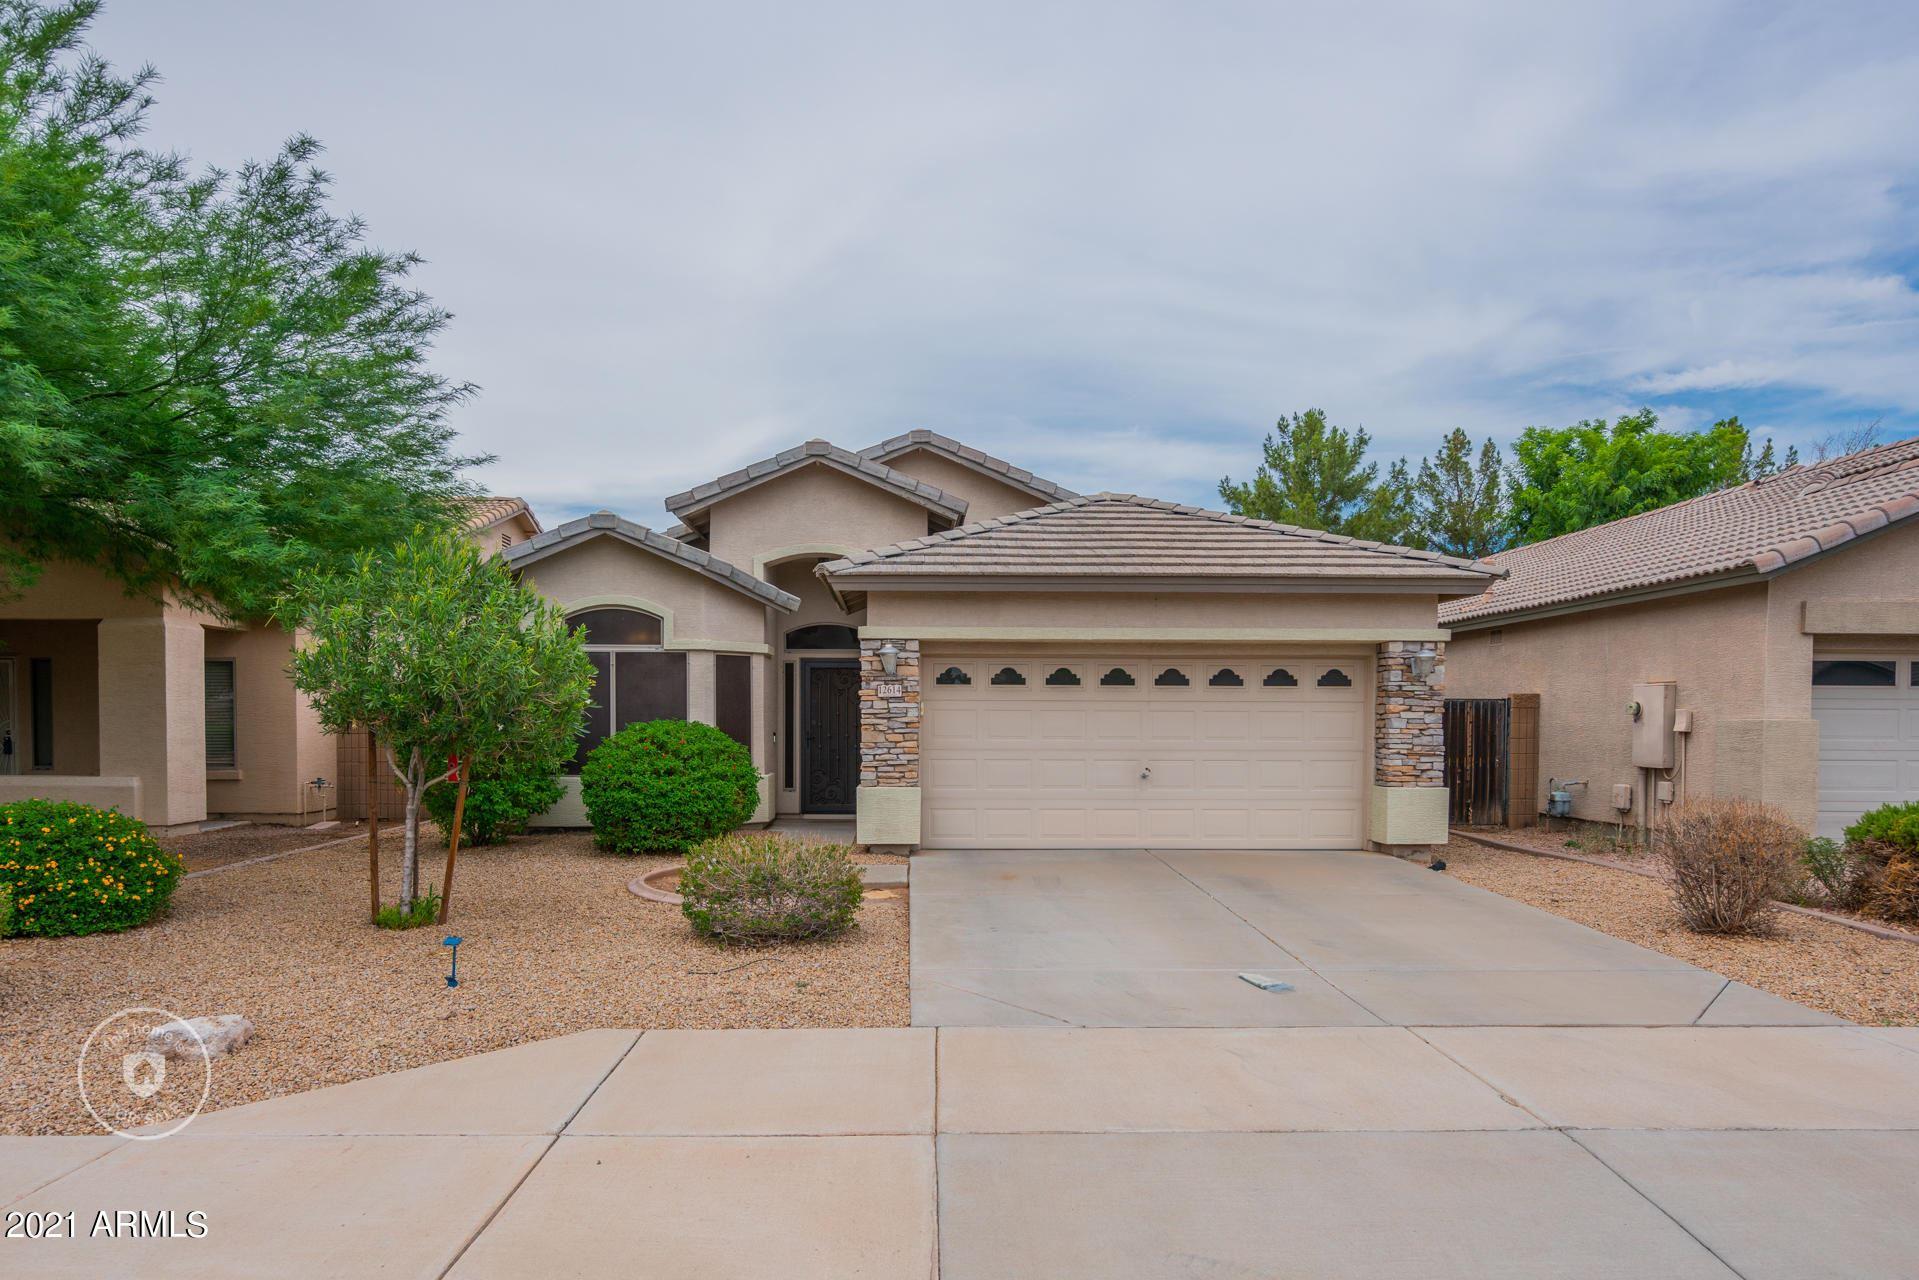 12614 W REDONDO Drive, Litchfield Park, AZ 85340 - MLS#: 6268526